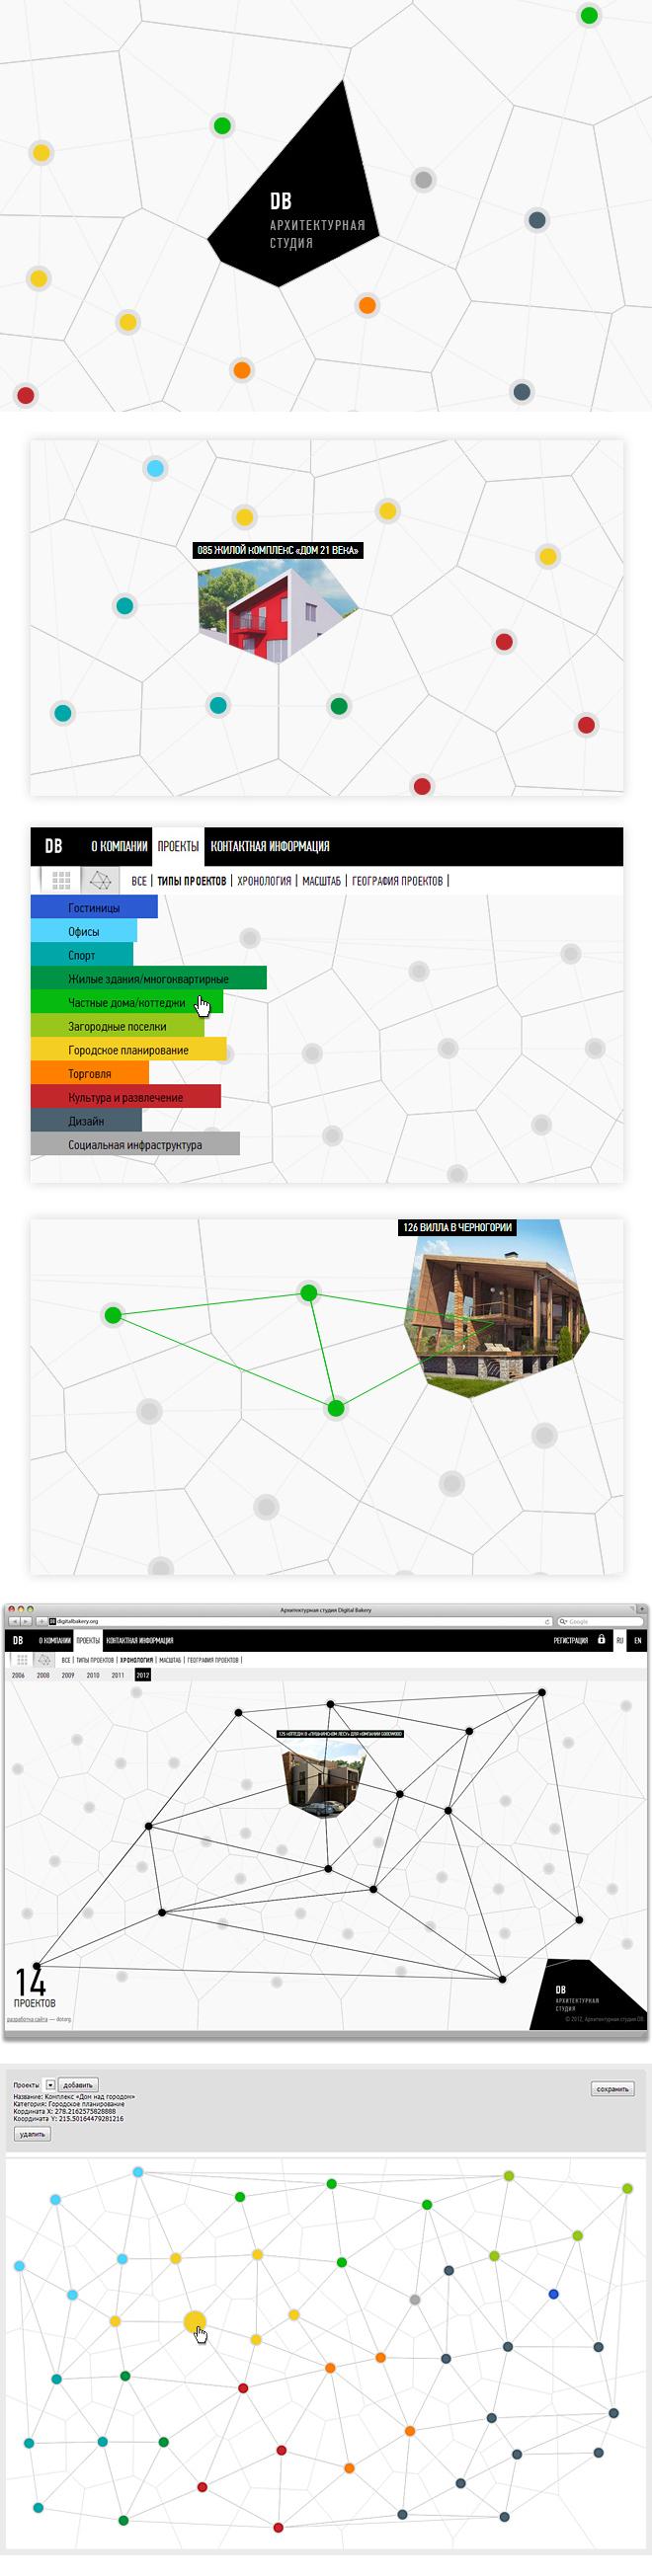 First generative website layout based on voronoi diagram adding first generative website layout based on voronoi diagram adding new project to the portfolio ccuart Choice Image